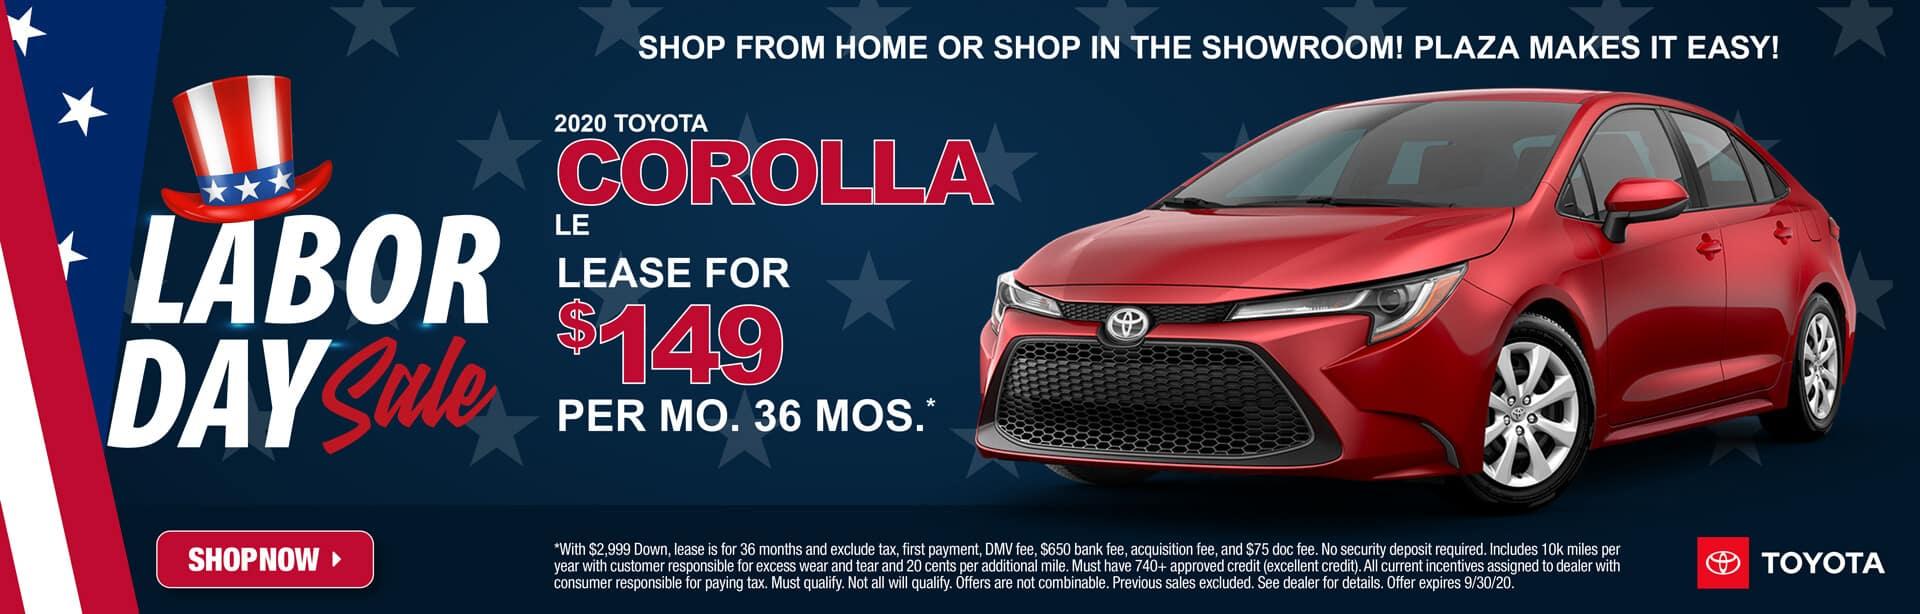 2020.08.25-Plaza-Toyota-Sept-Web-1-S48334vw-5